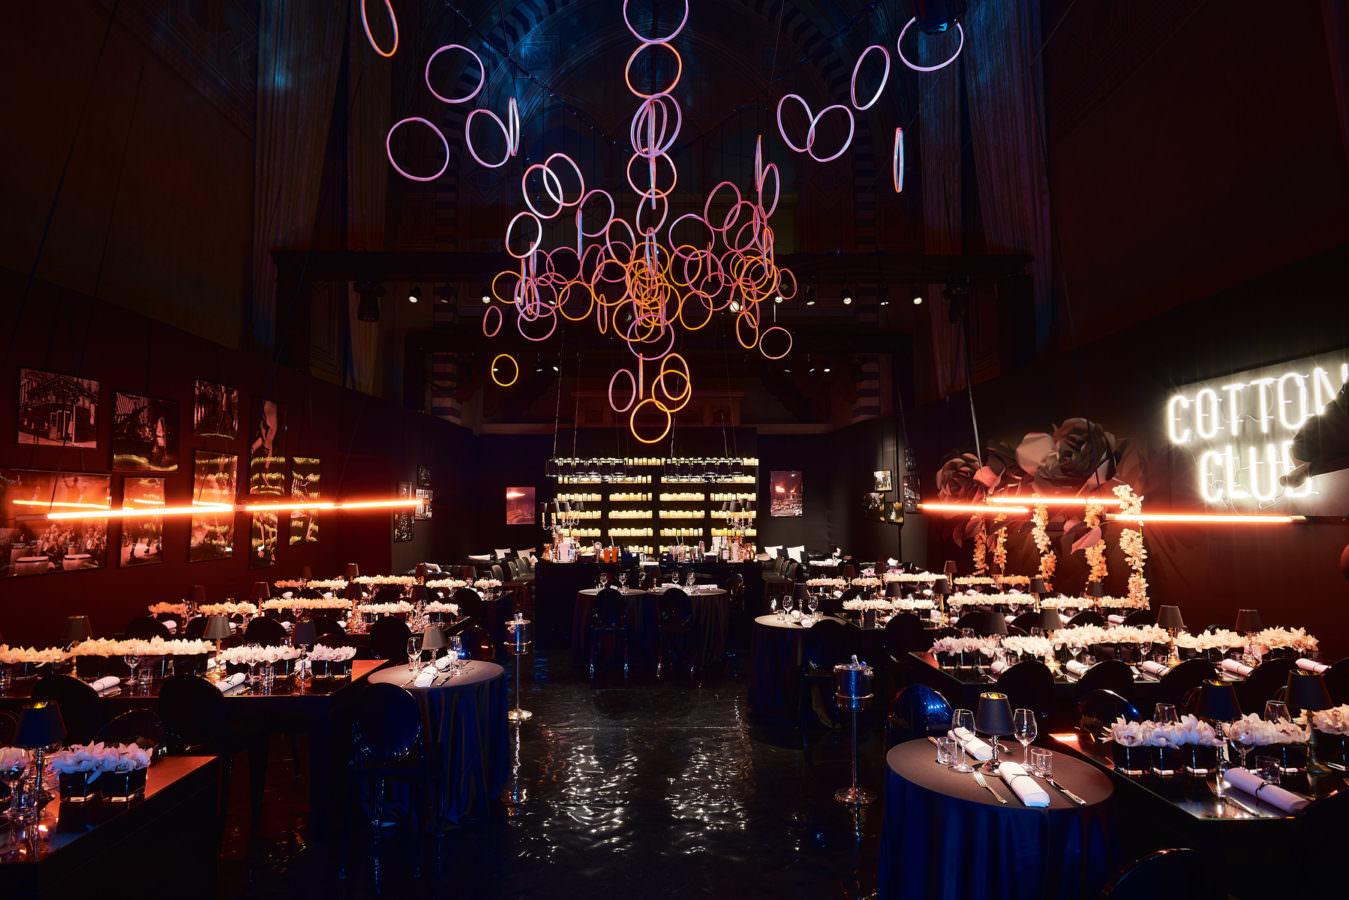 Cotton club luxury party Four Seasons Gabriele Fani photography